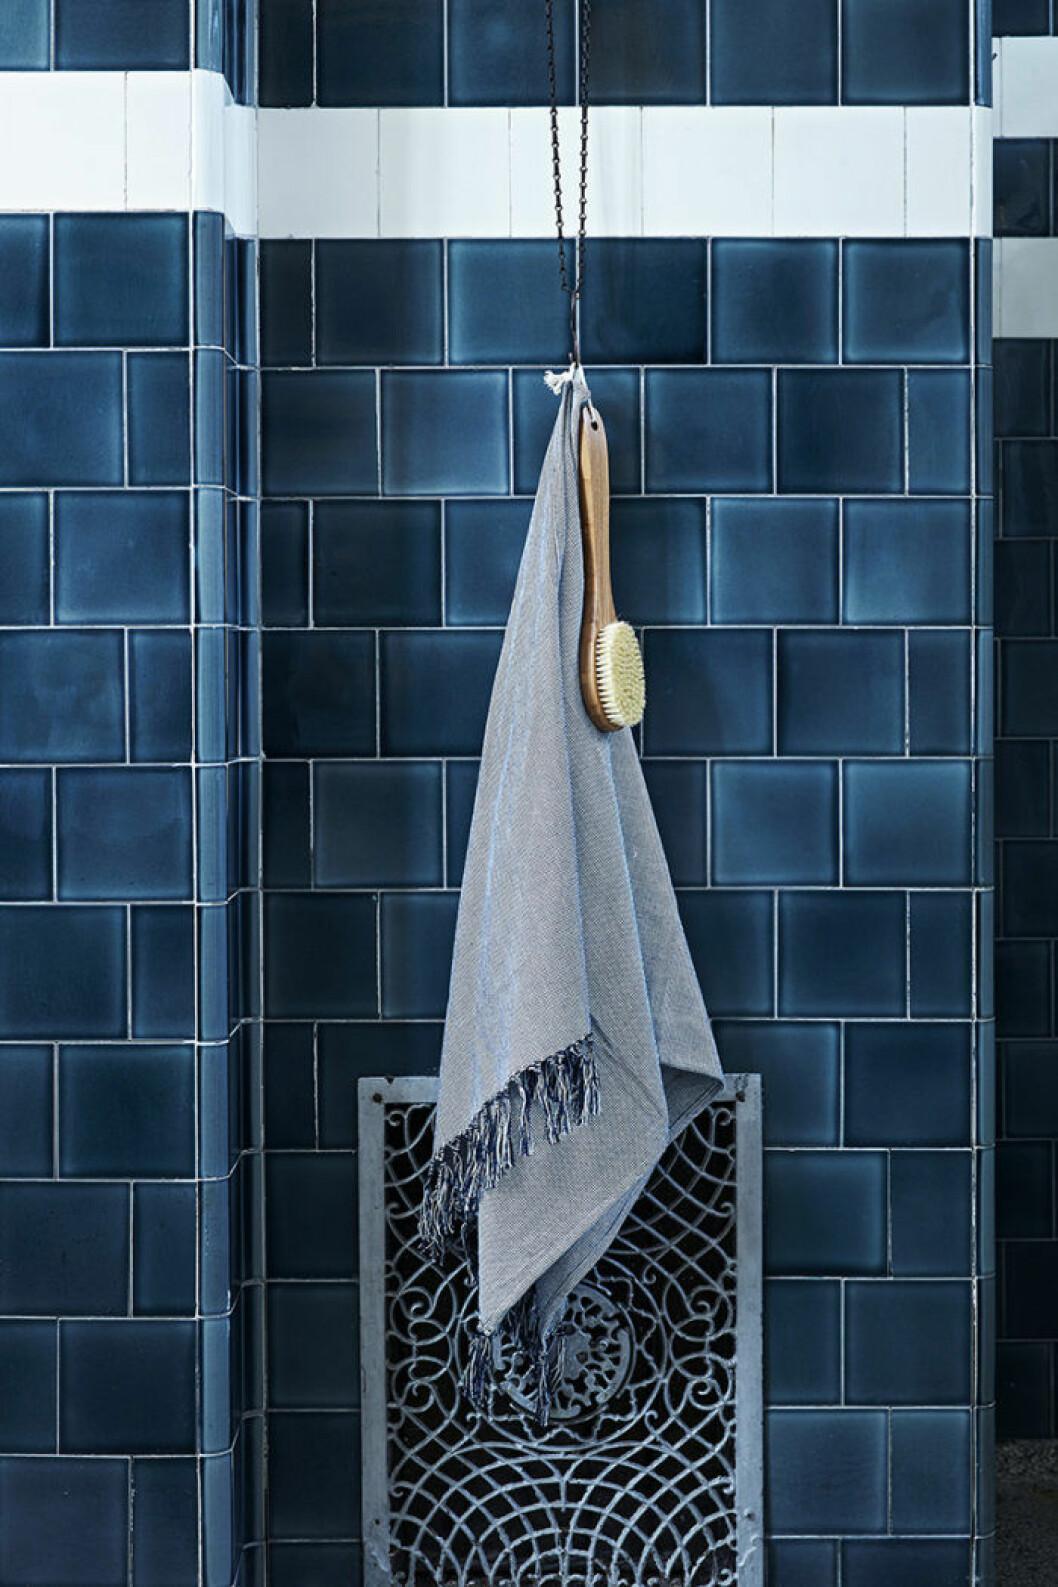 Ikeas kollektion Innehållsrik, turkost badrum.